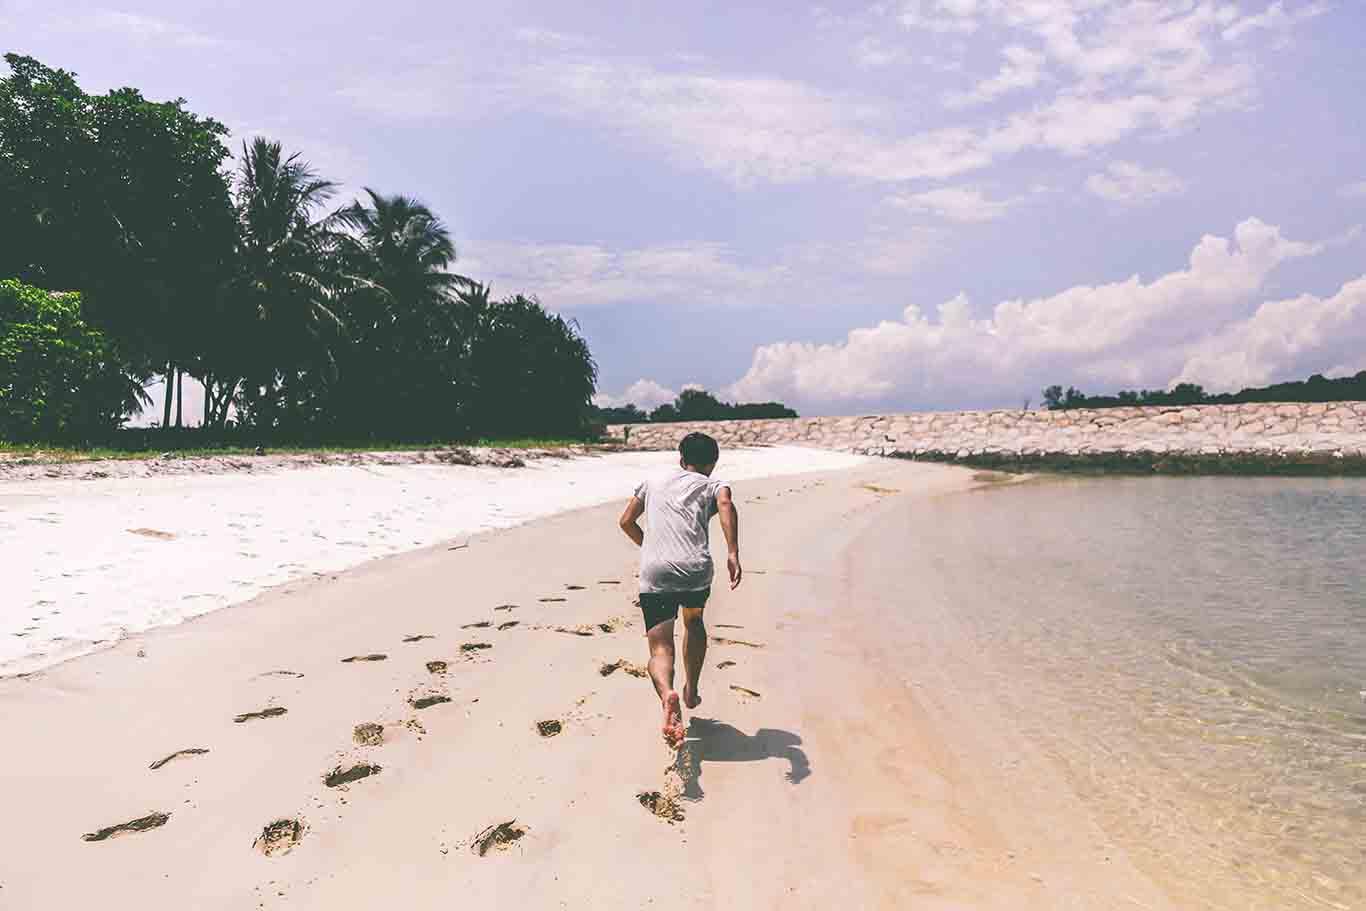 Strandworkout – Strandlauf